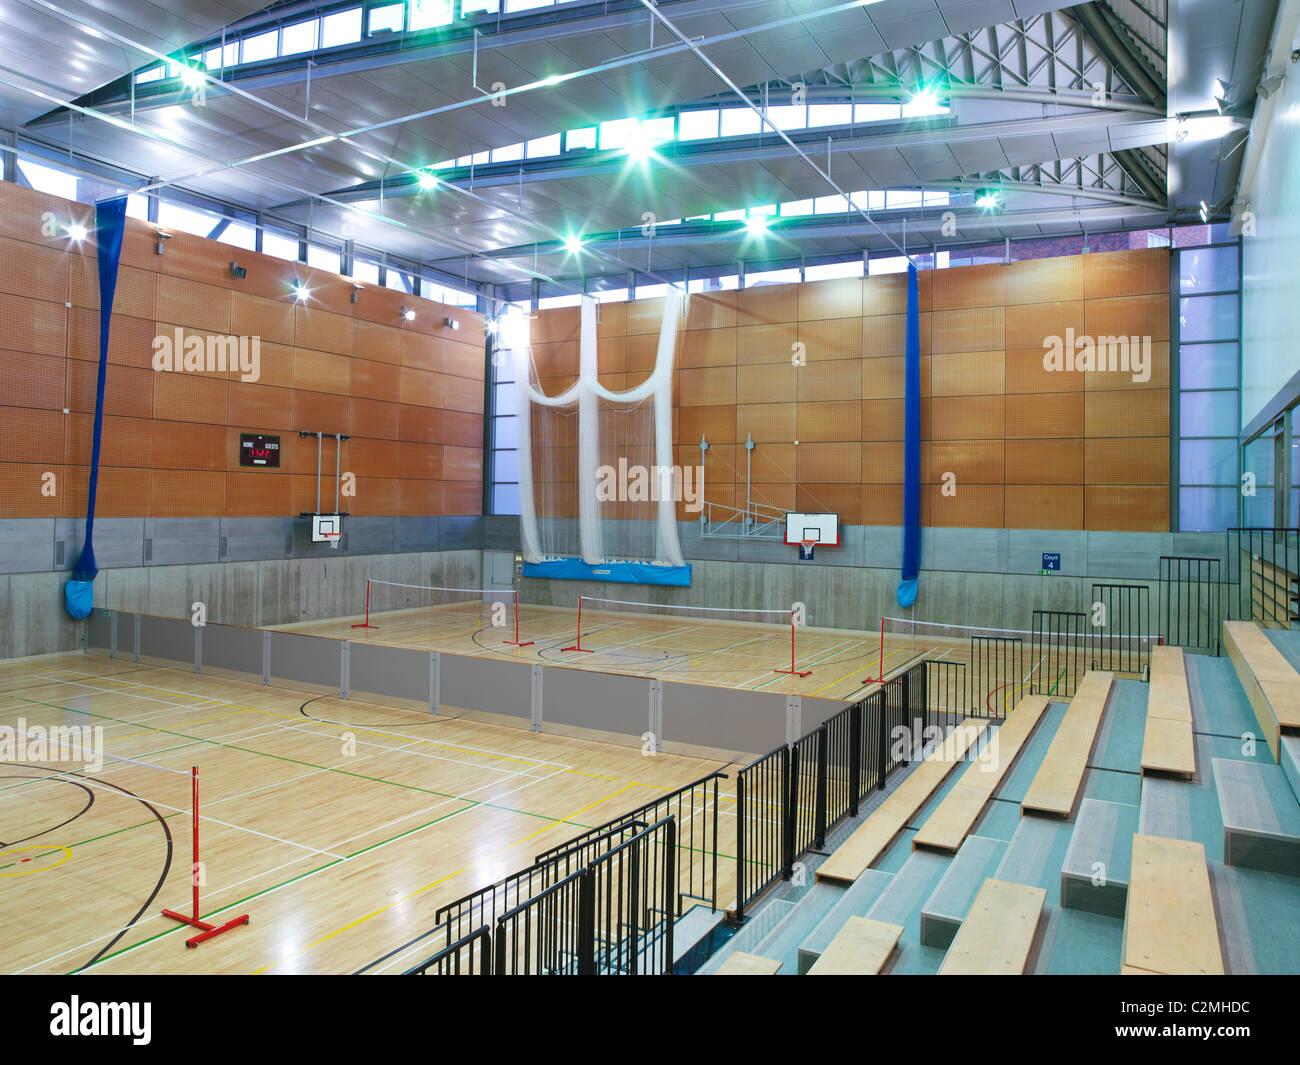 LB Hackney Clissold Leisure Centre, Hackney, London - Stock Image